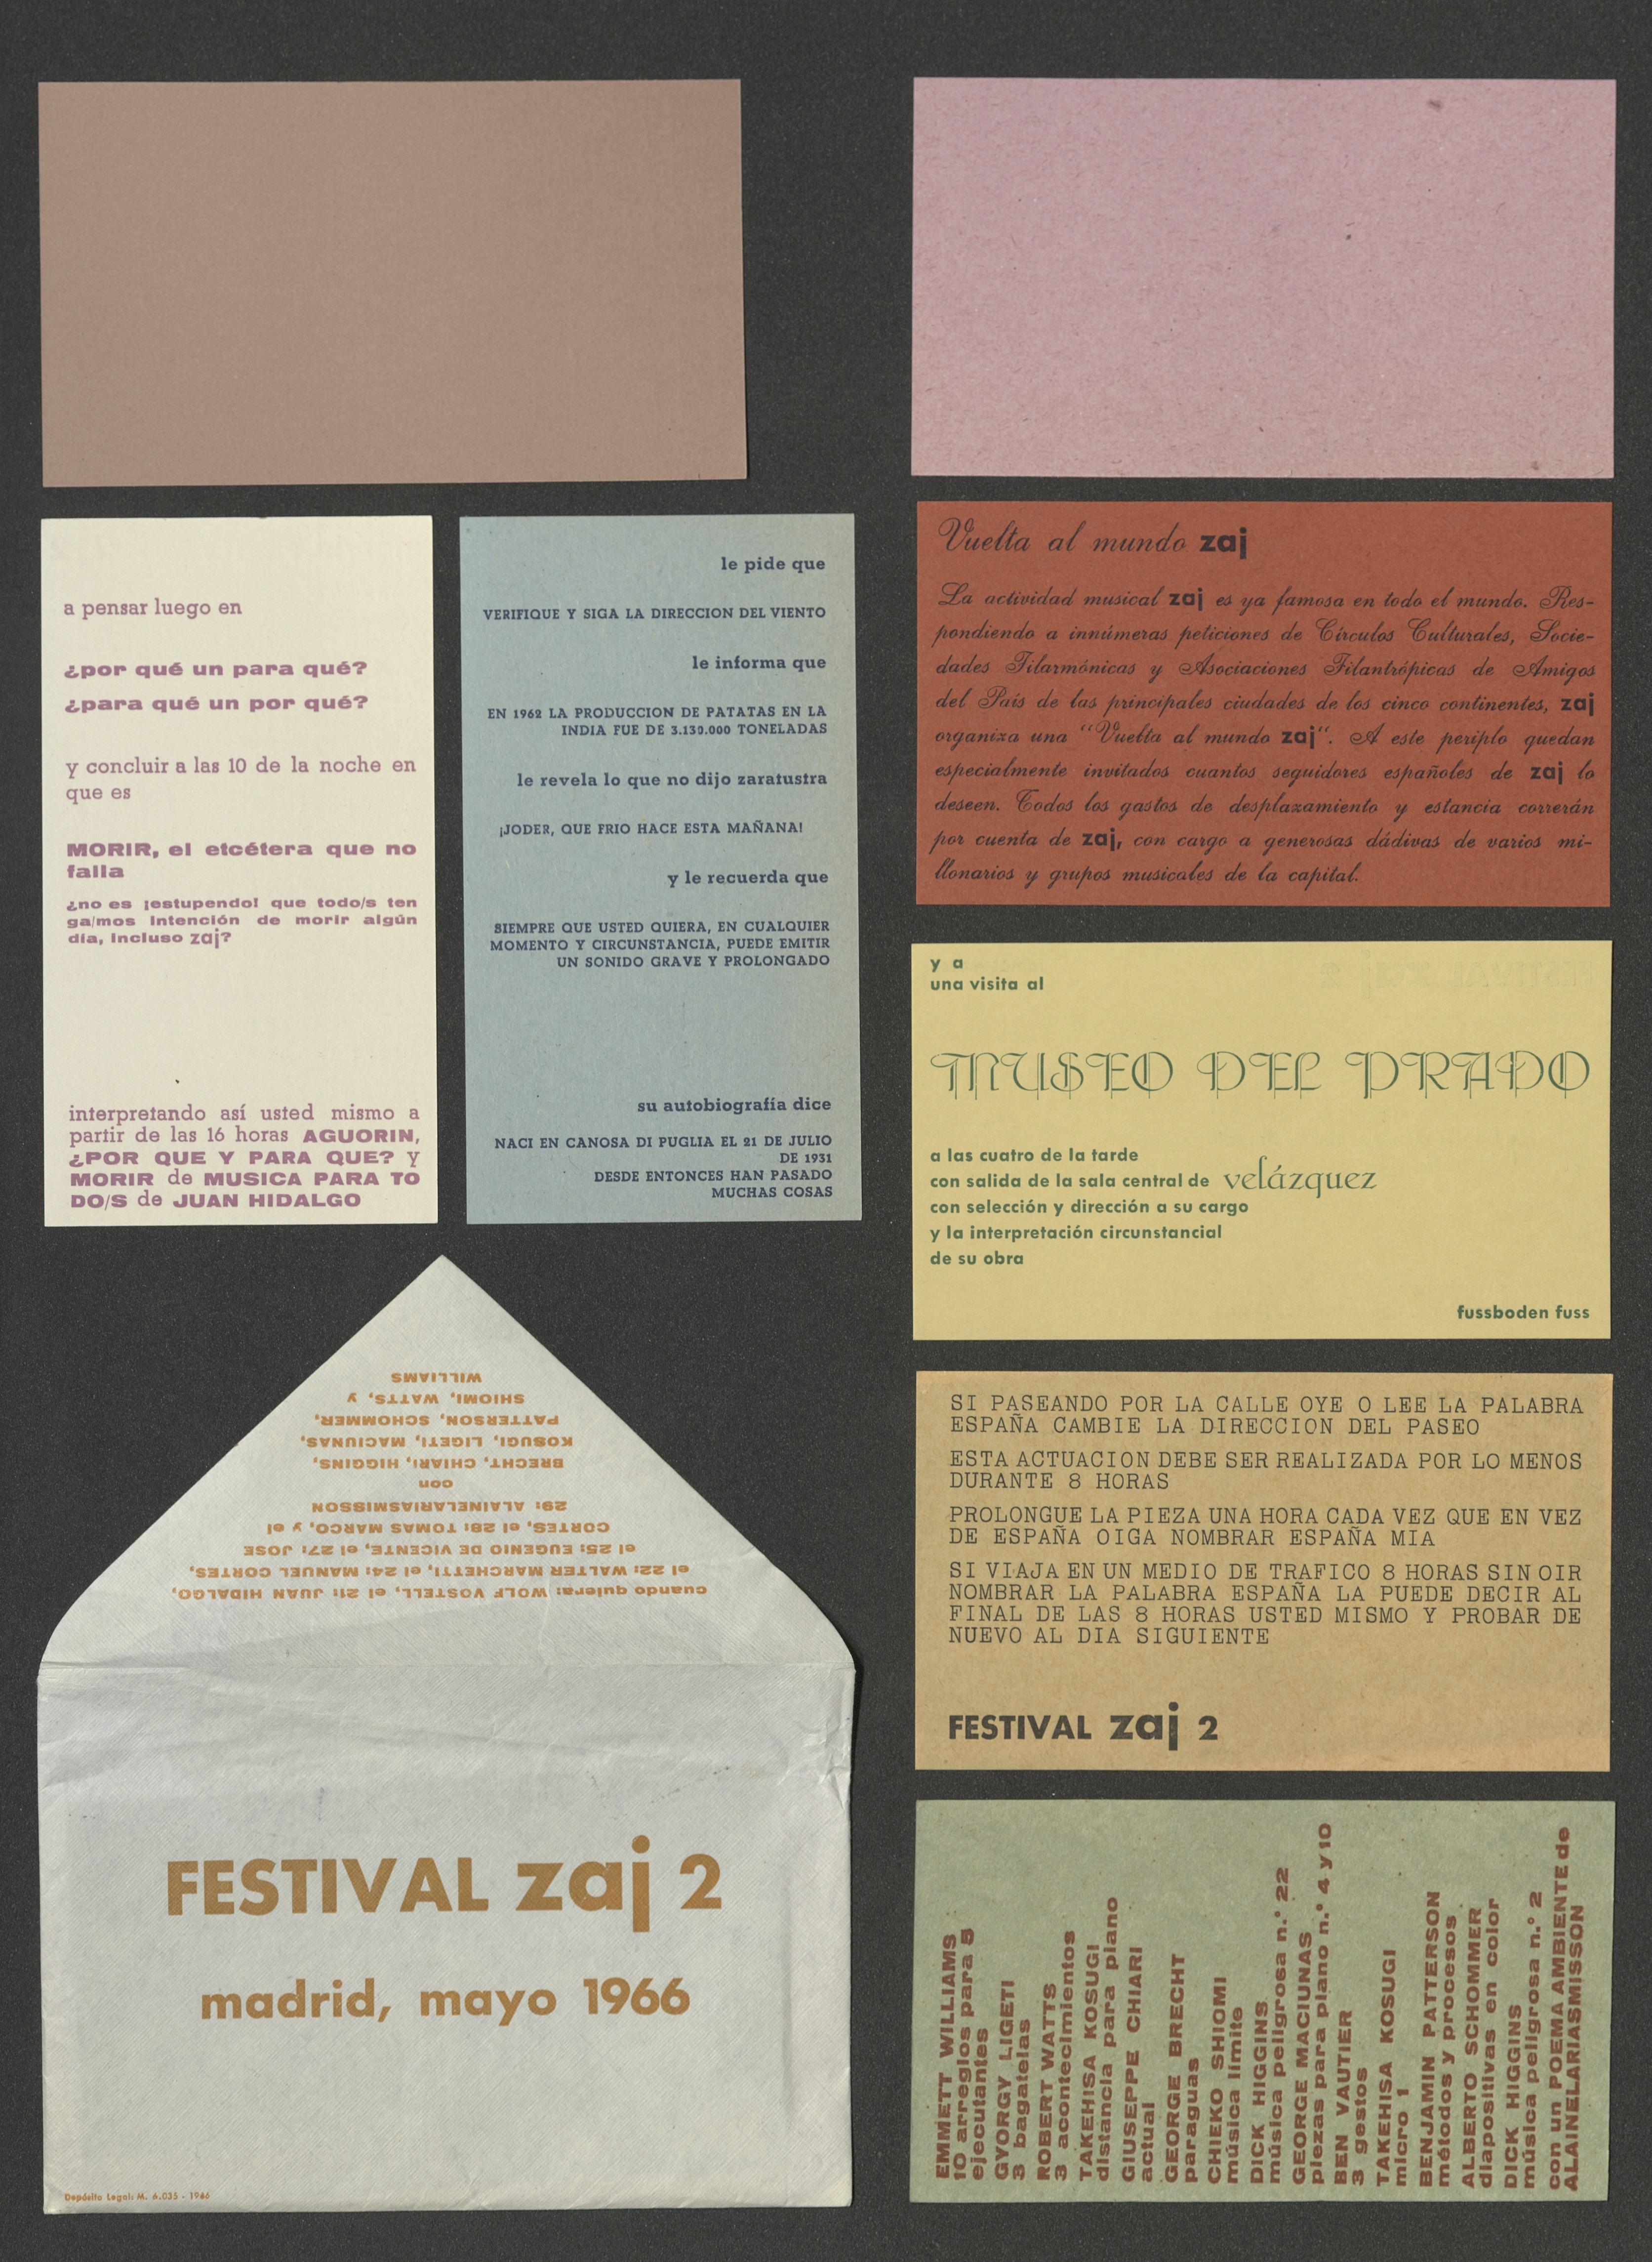 Invitation cards: FESTIVAL ZAJ 2, MADRID 1966; Archiv der Avantgarden, Staatliche Kunstsammlungen Dresden